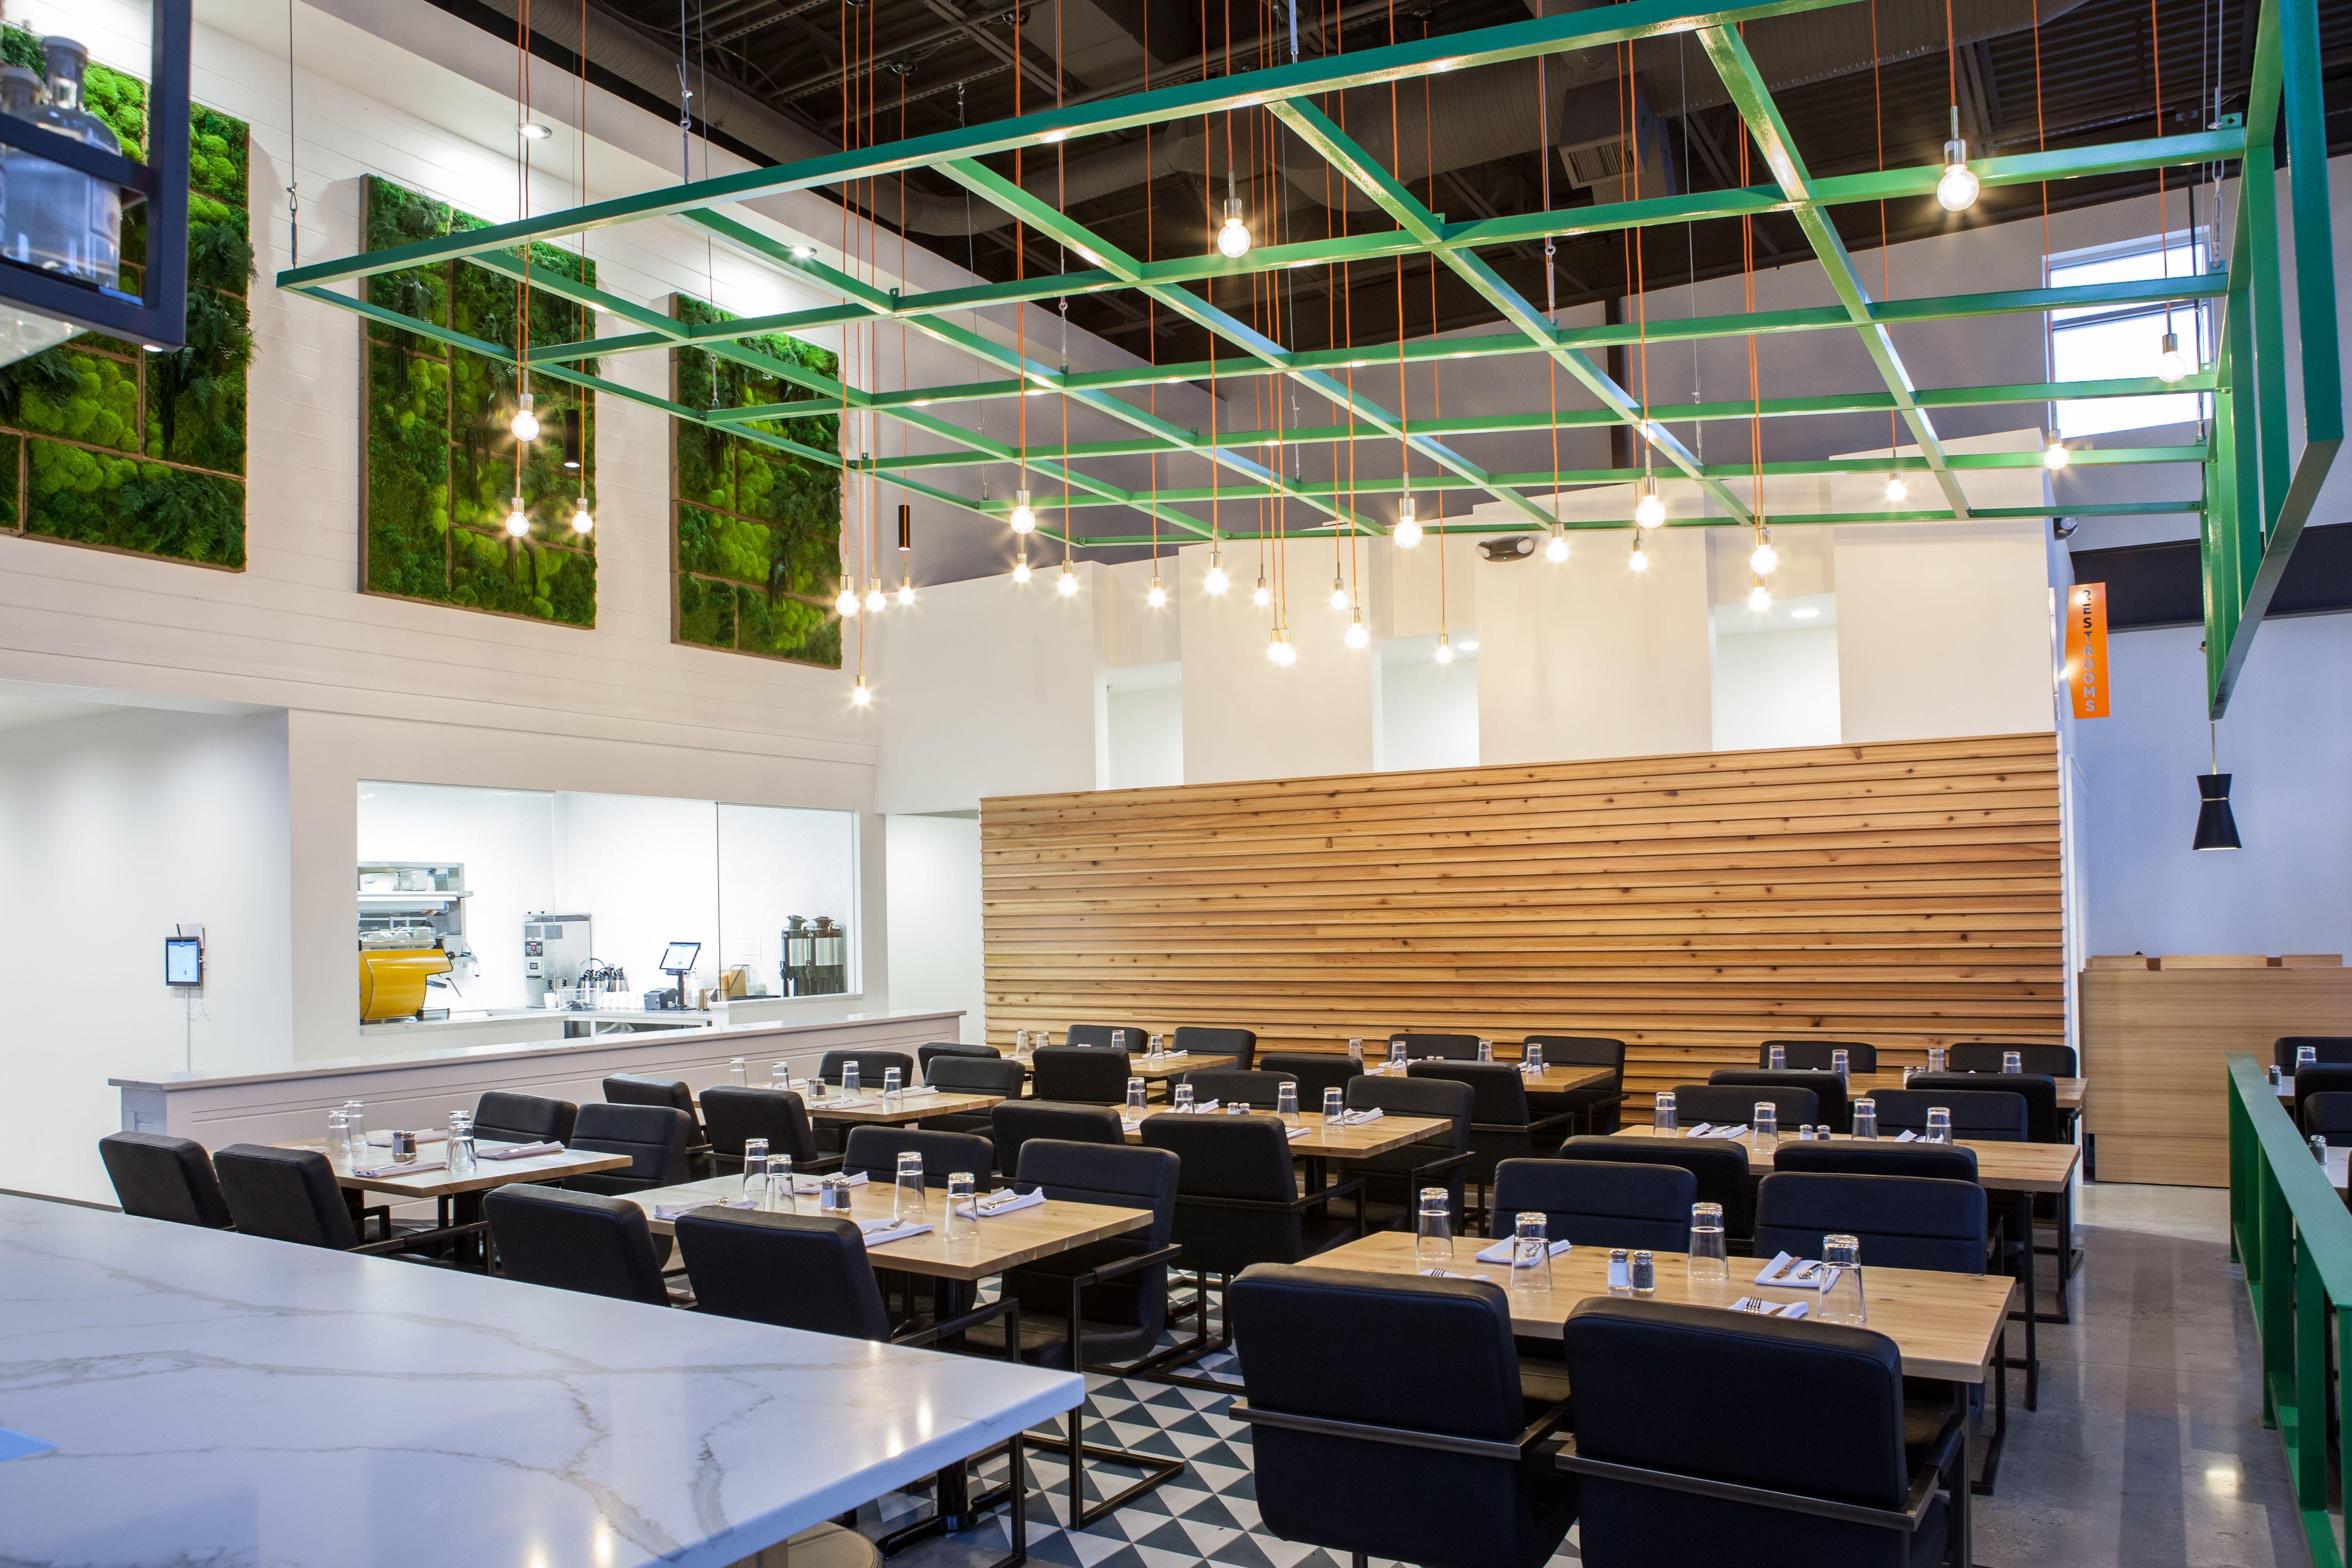 Everly restaurant food fight restaurant restaurant